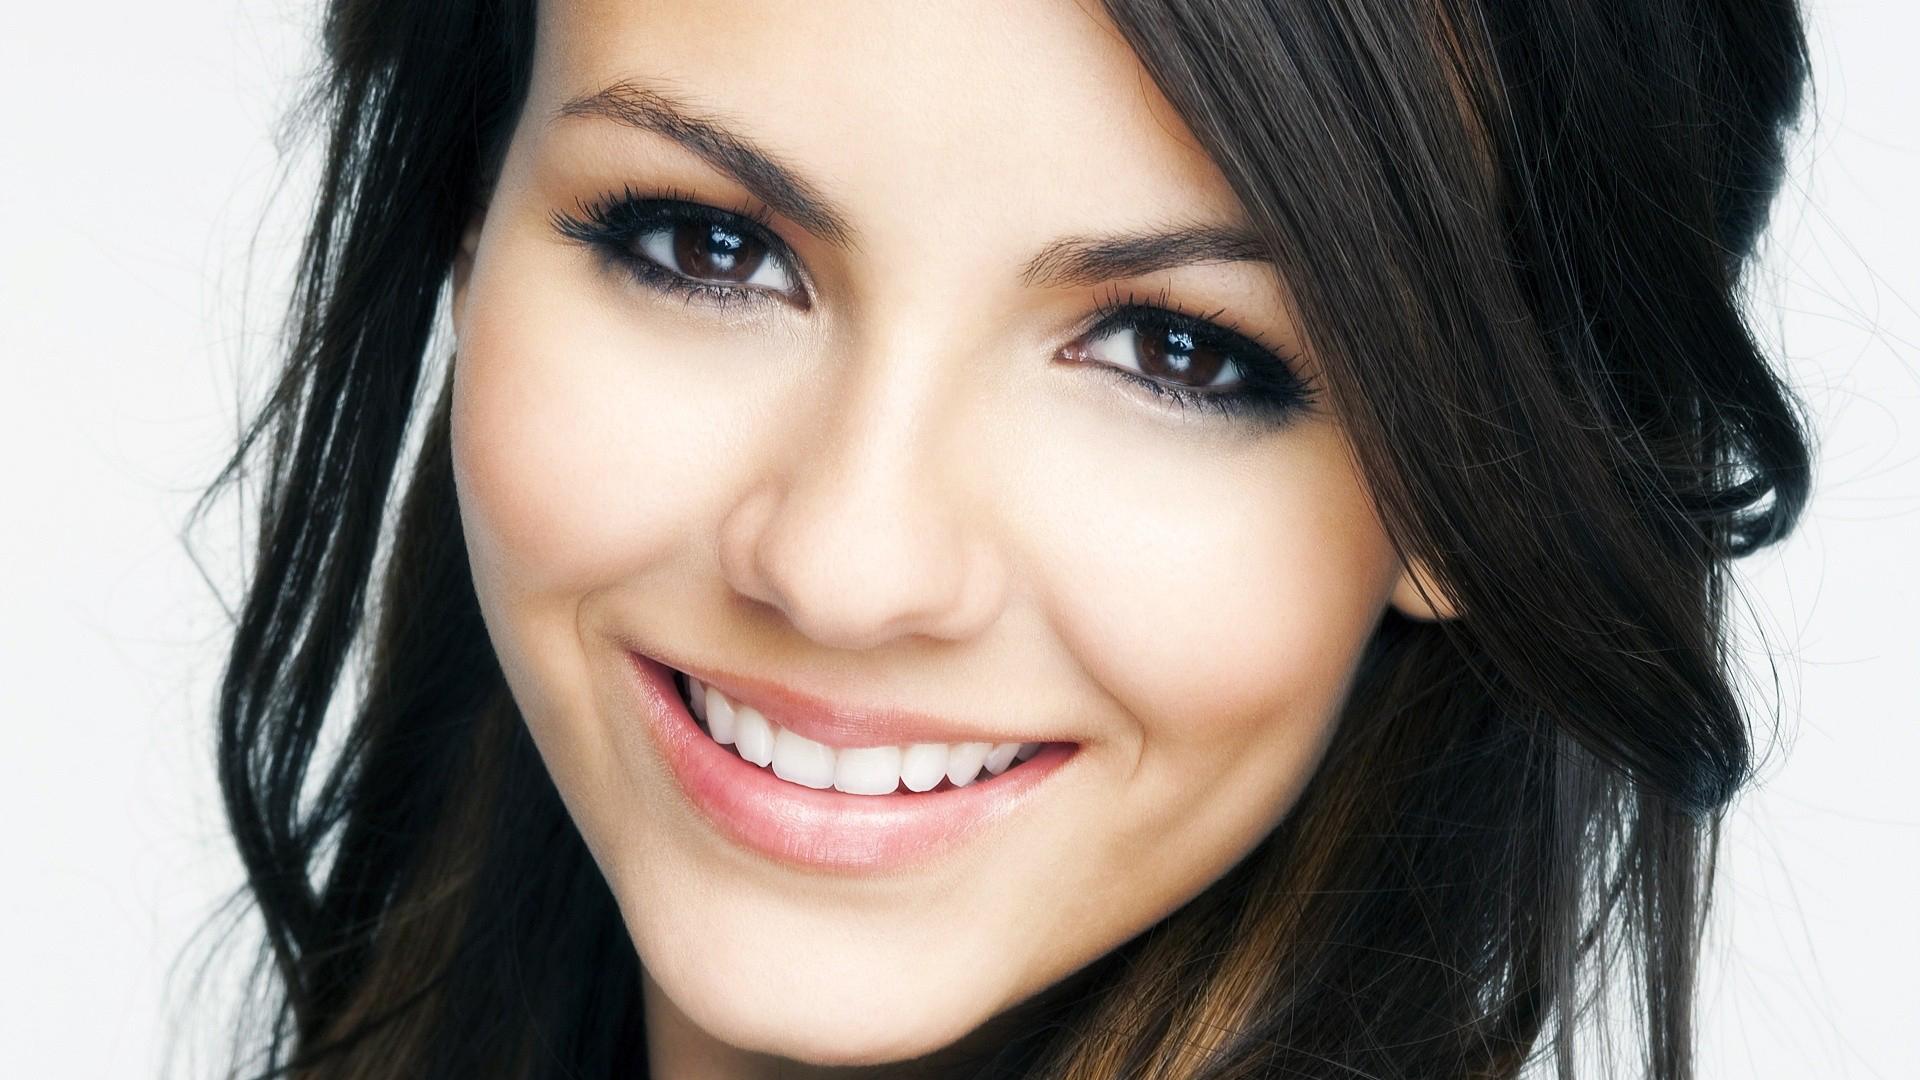 beautiful female celebrities wallpapers - photo #21